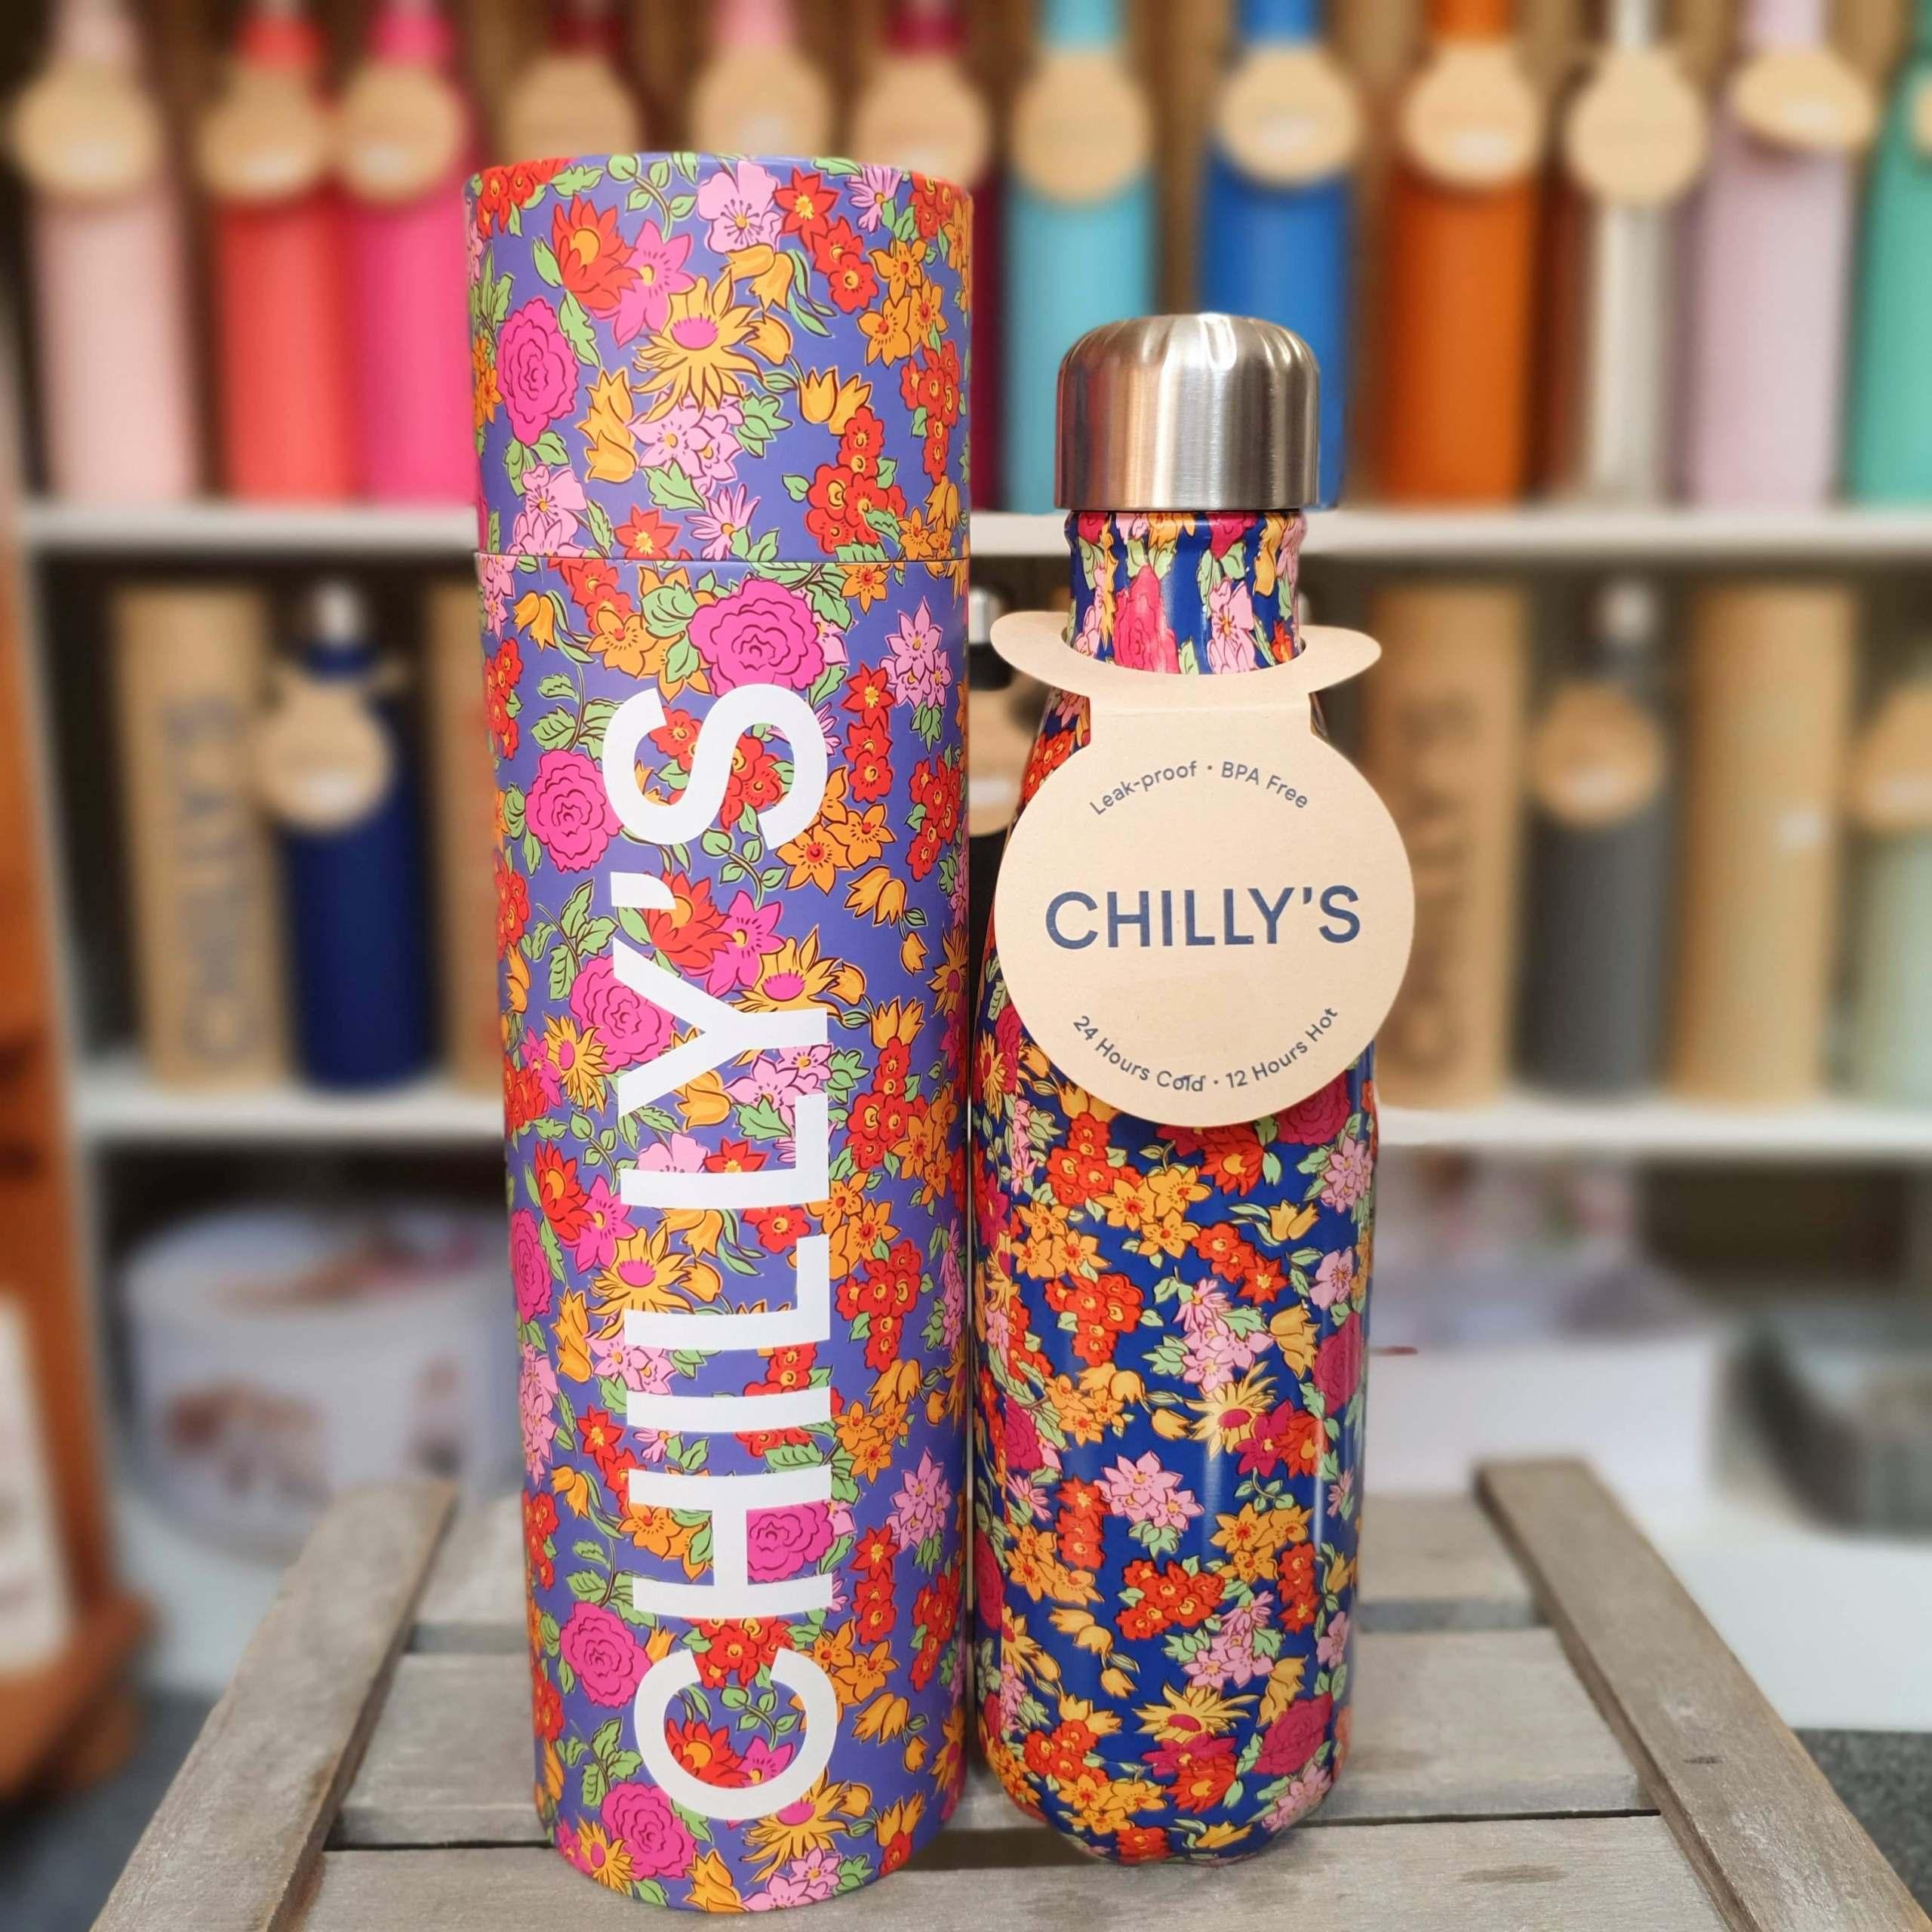 Wild Rose Chilly's Bottle